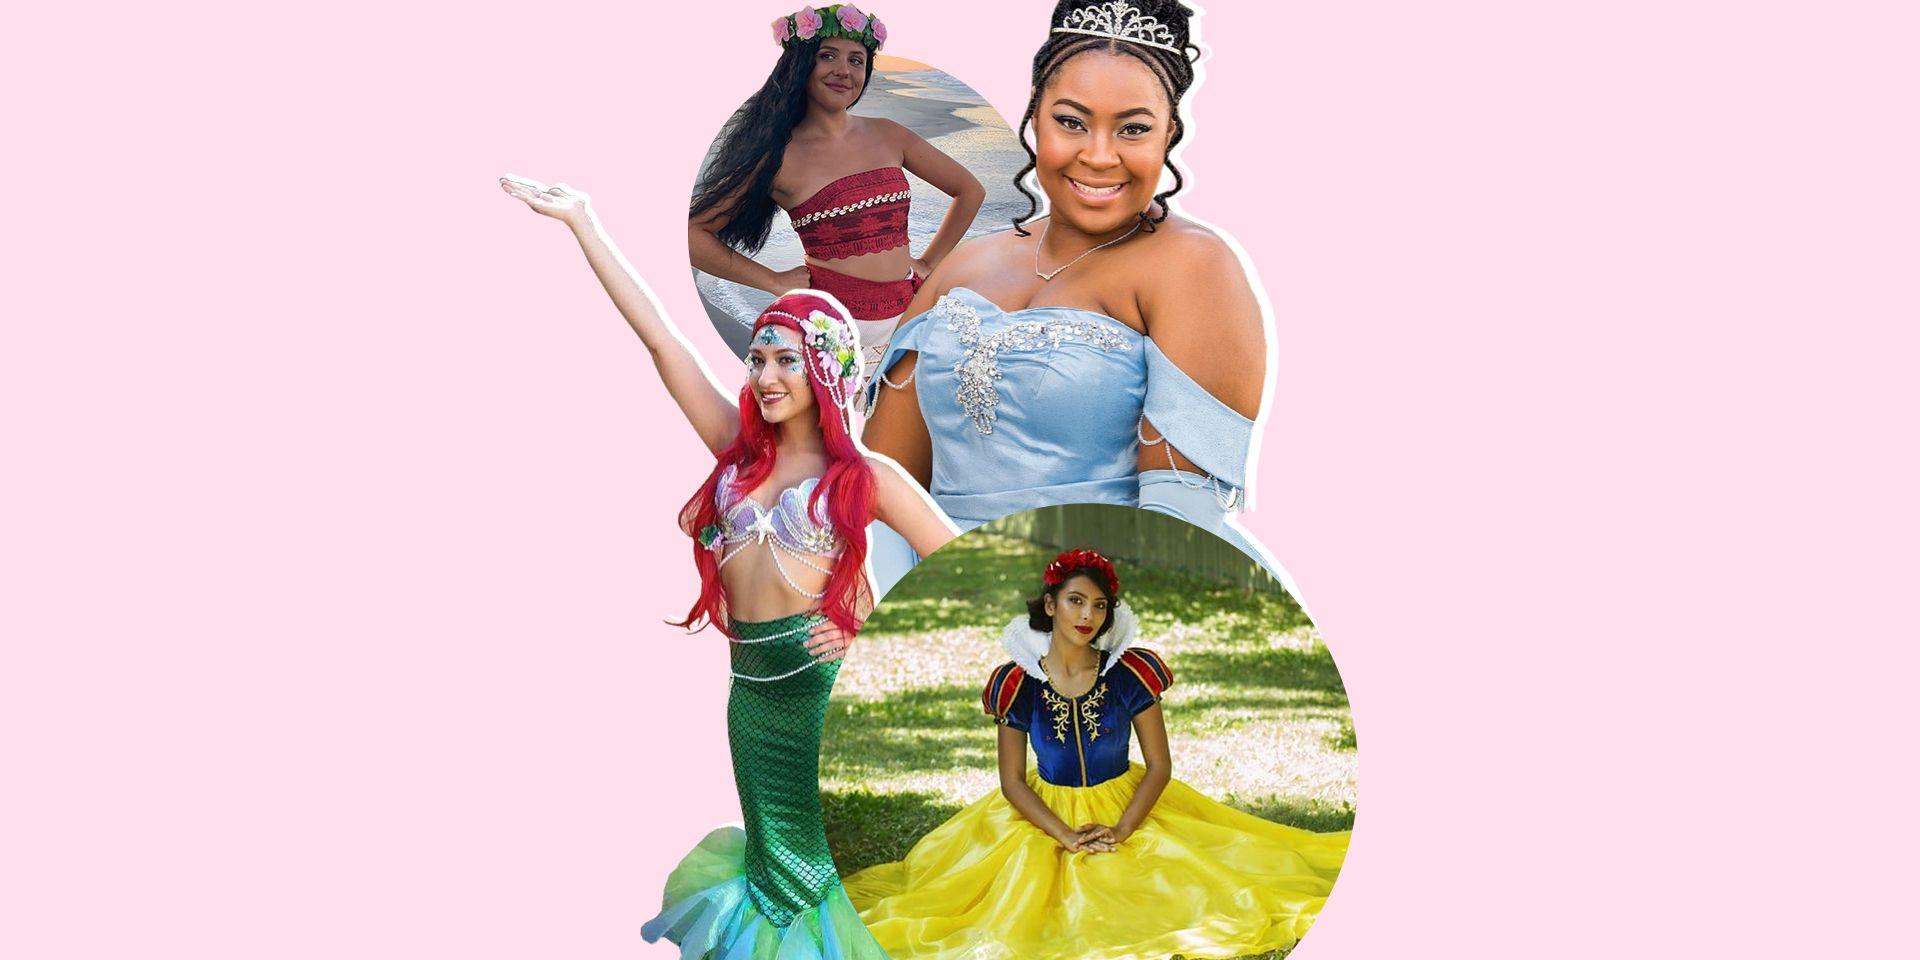 Badass disney princess costumes